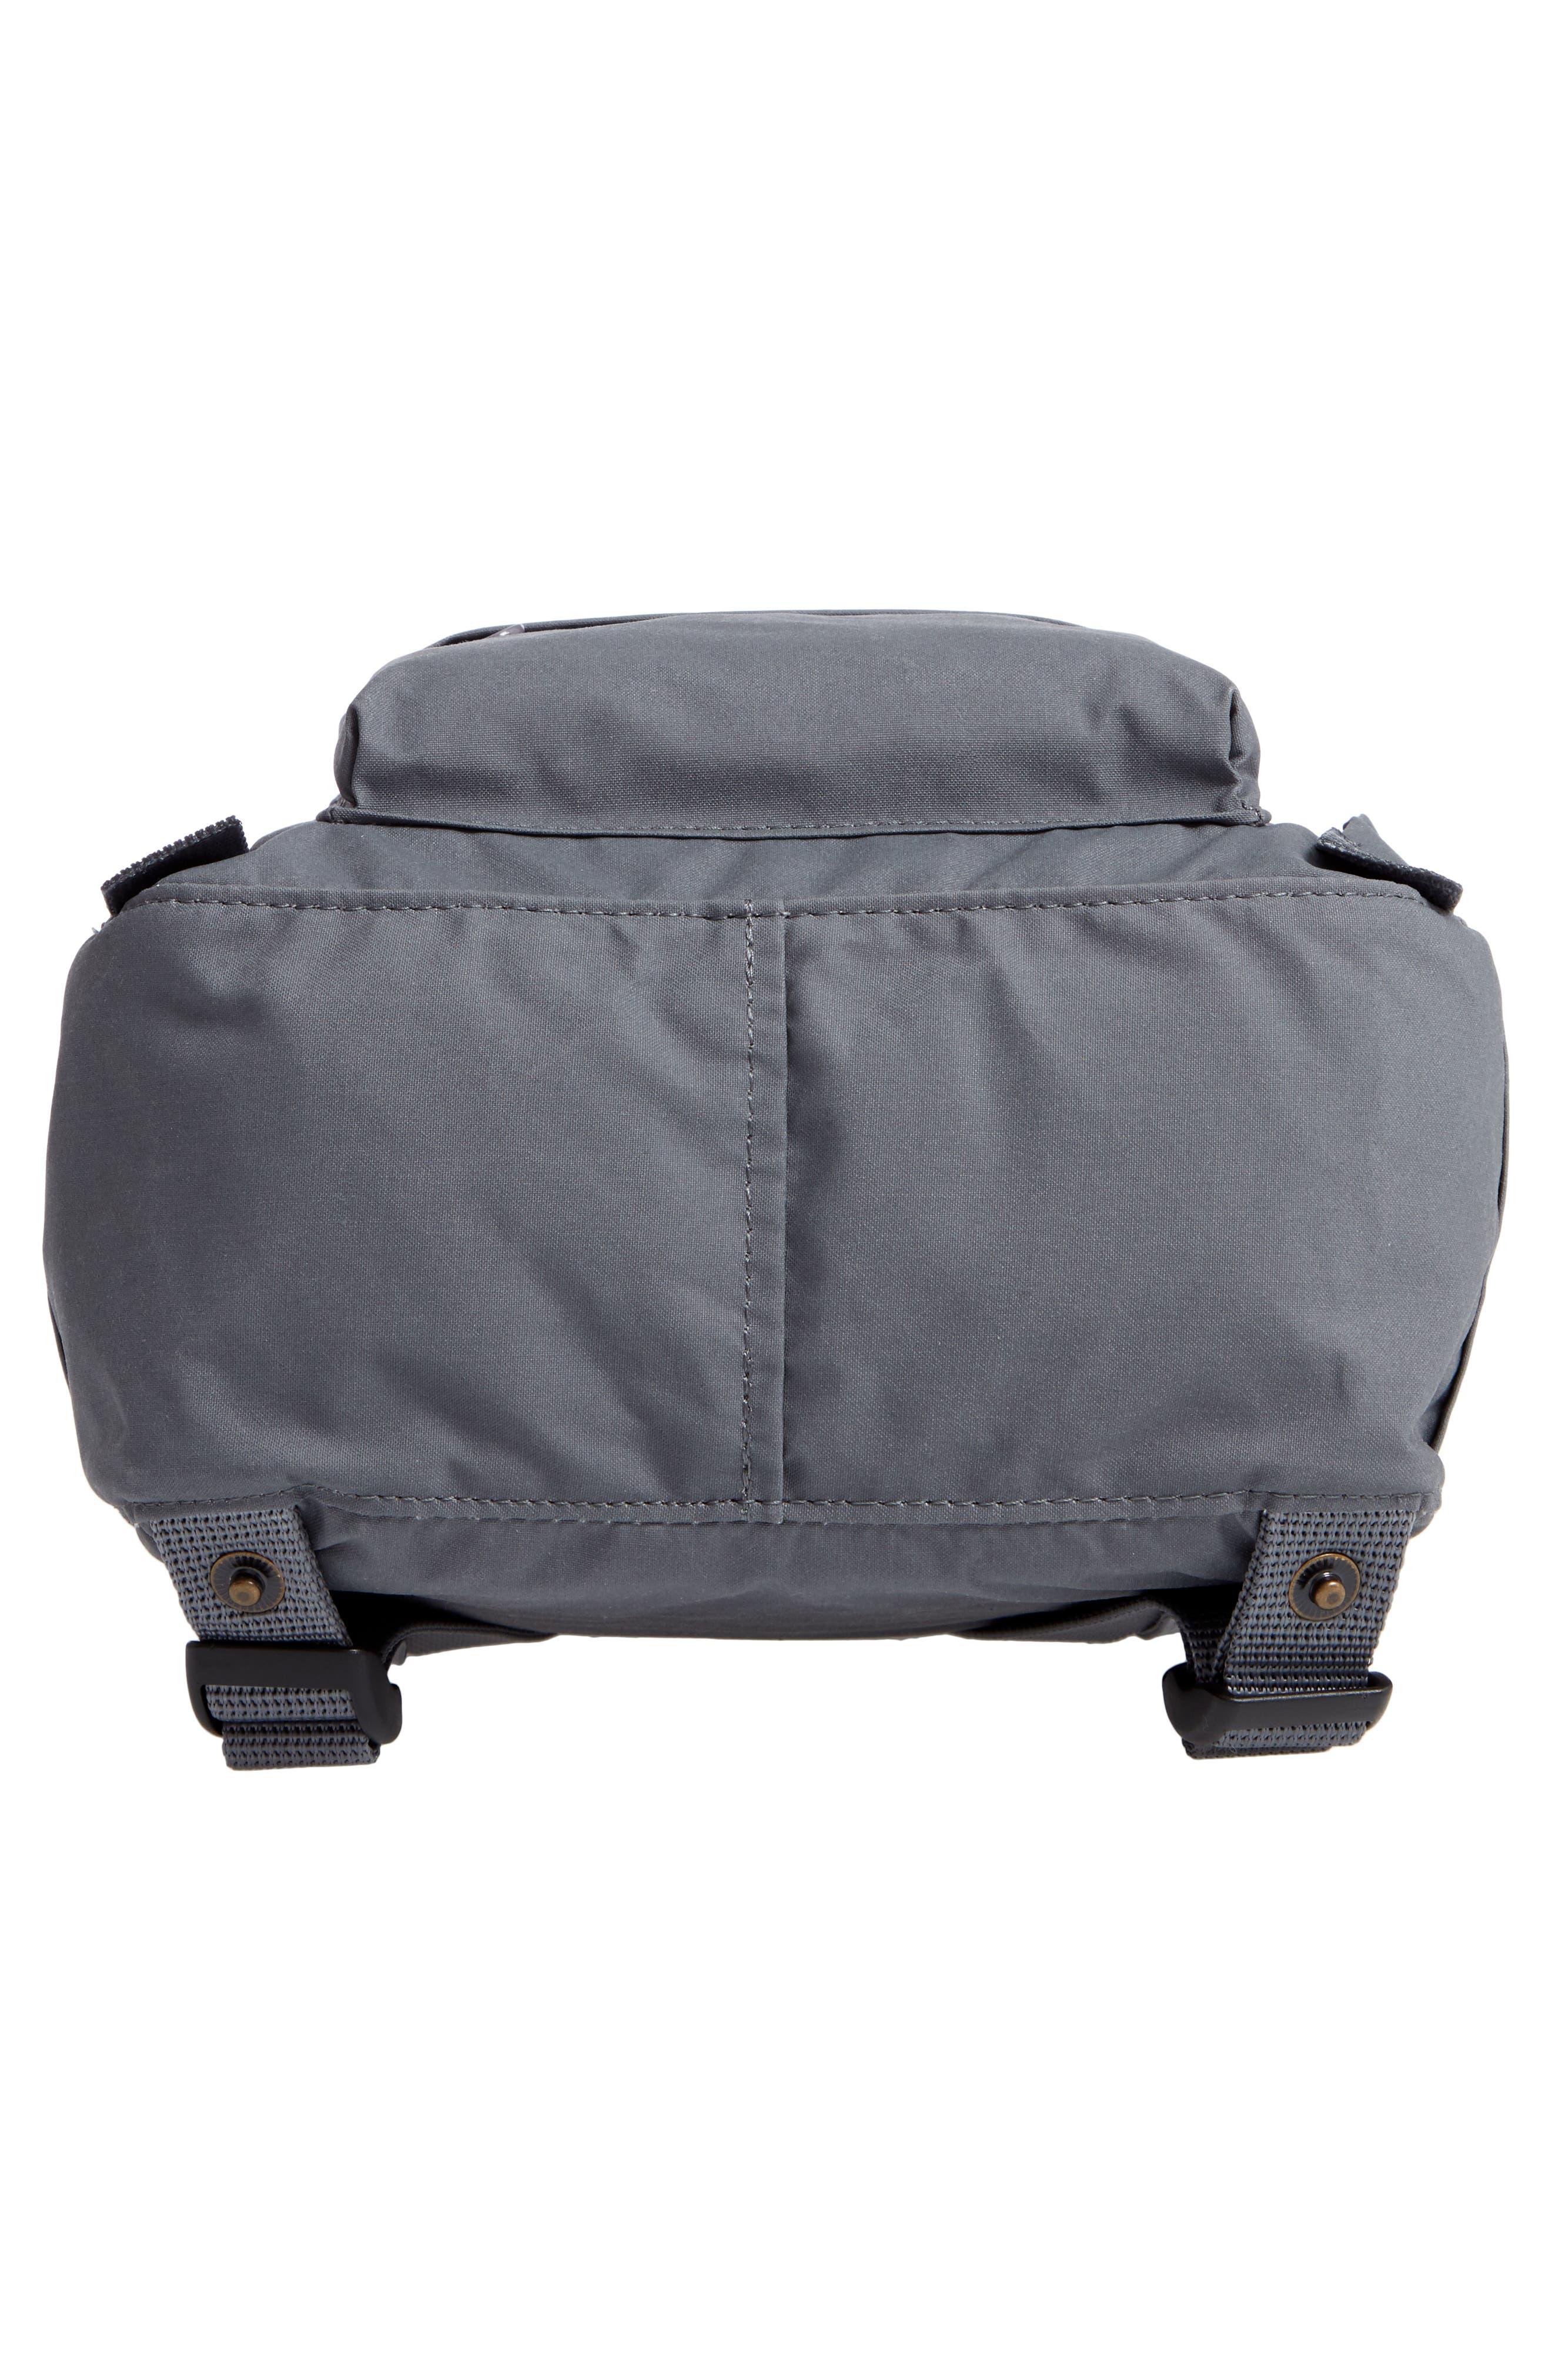 'Mini Kånken' Water Resistant Backpack,                             Alternate thumbnail 3, color,                             Super Grey